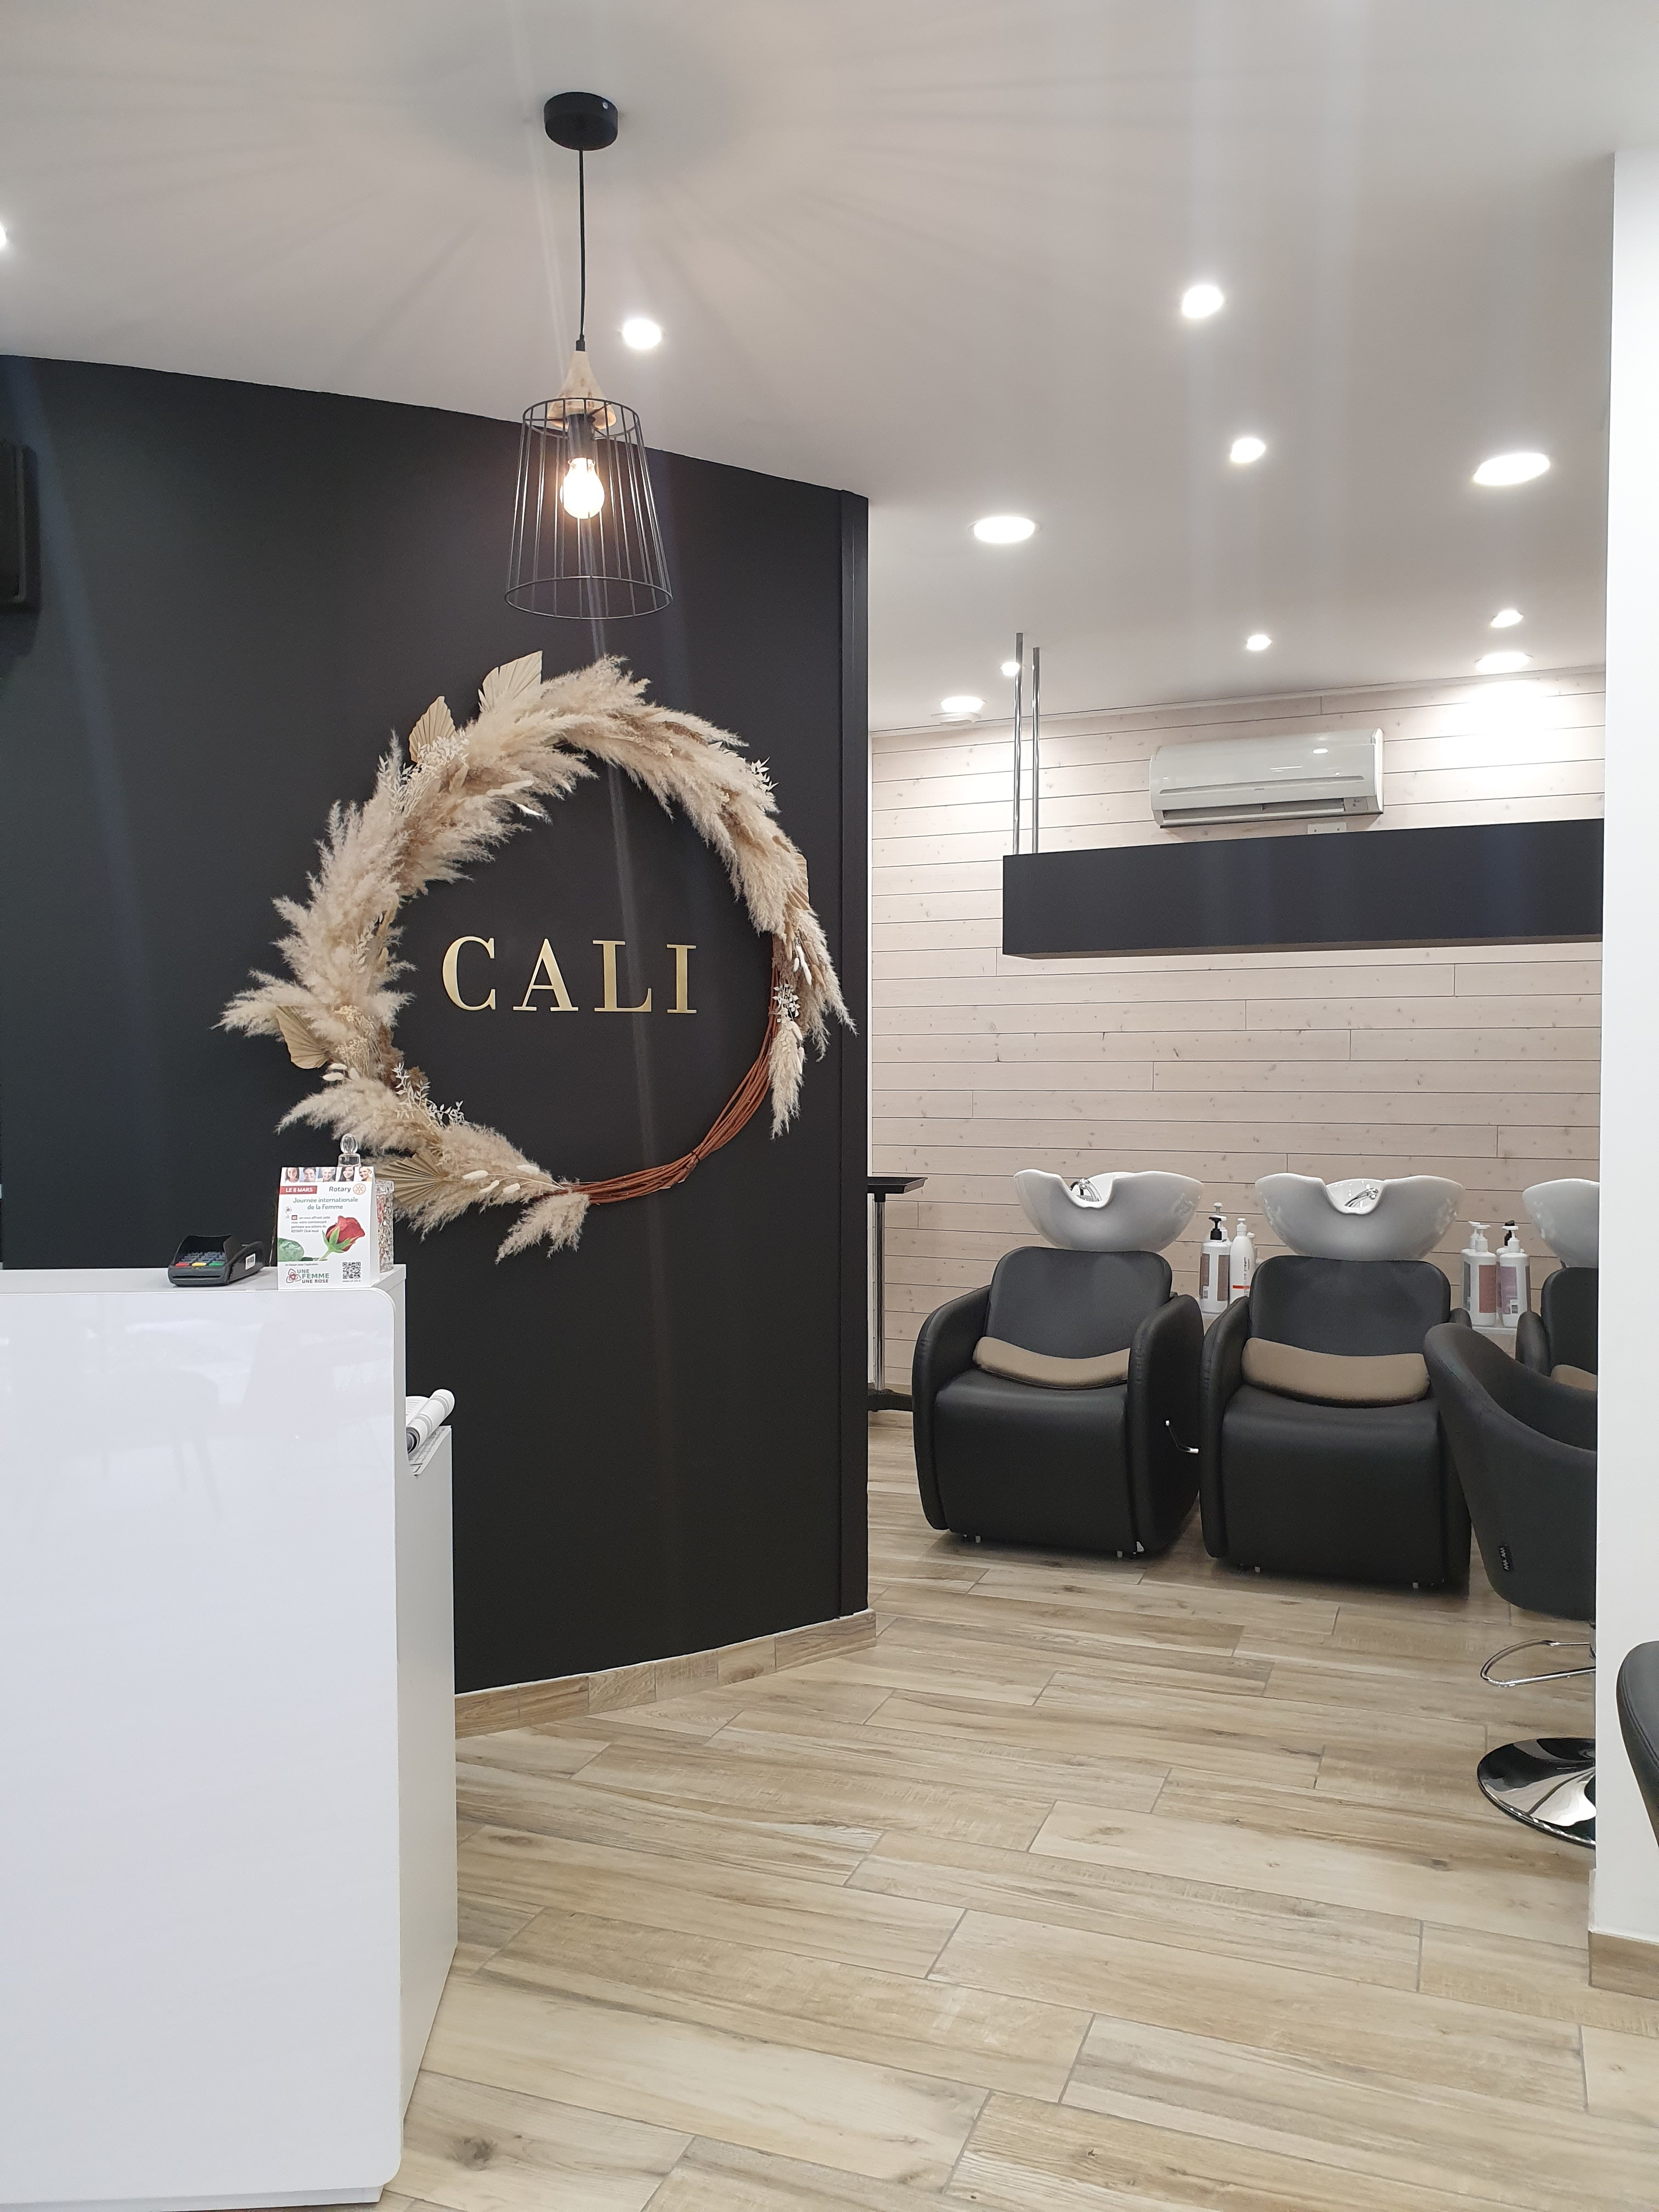 Galerie d'image - CALI